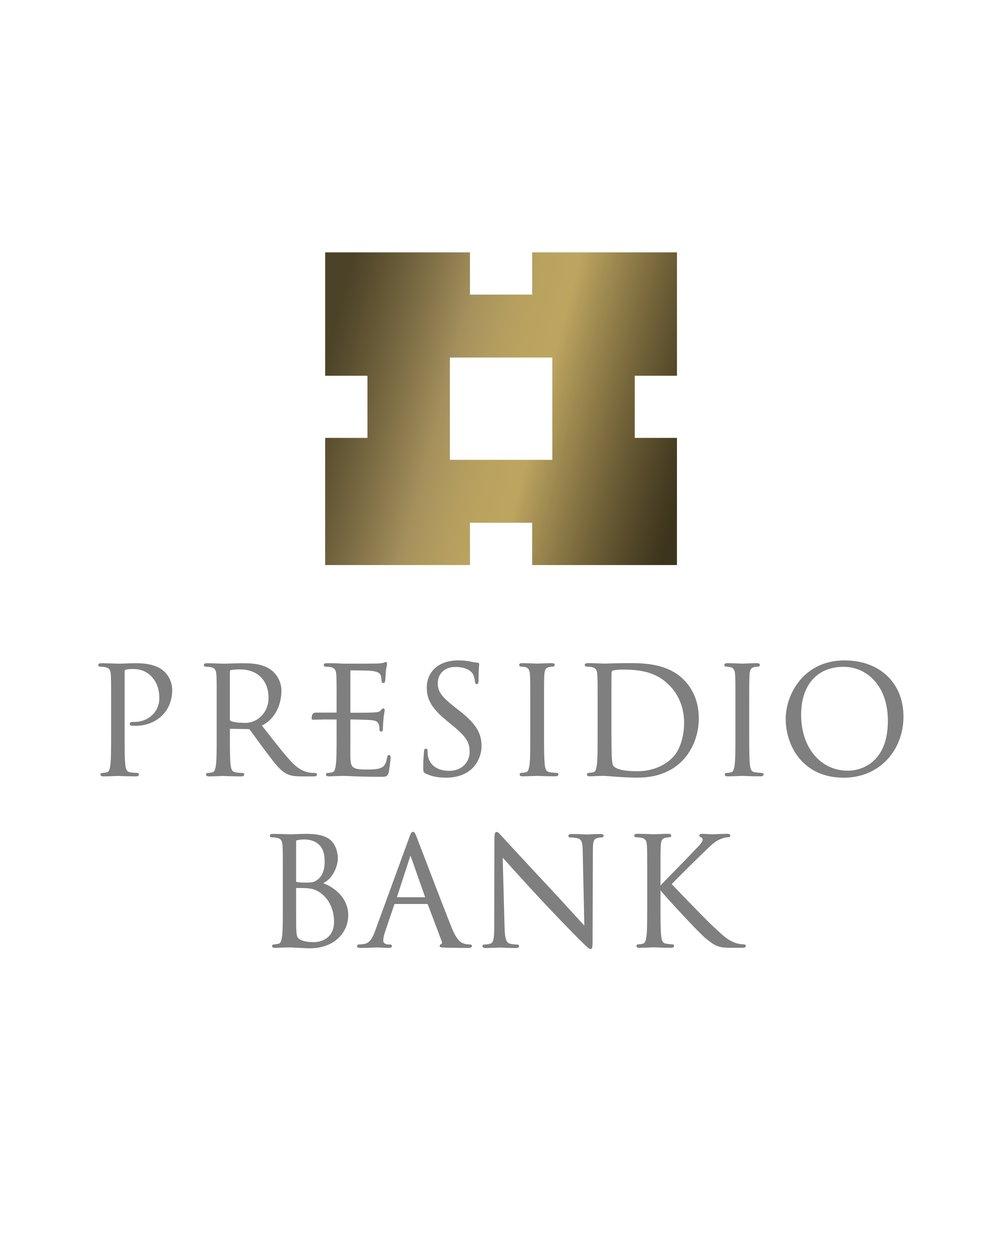 presidio bank JPG.jpg